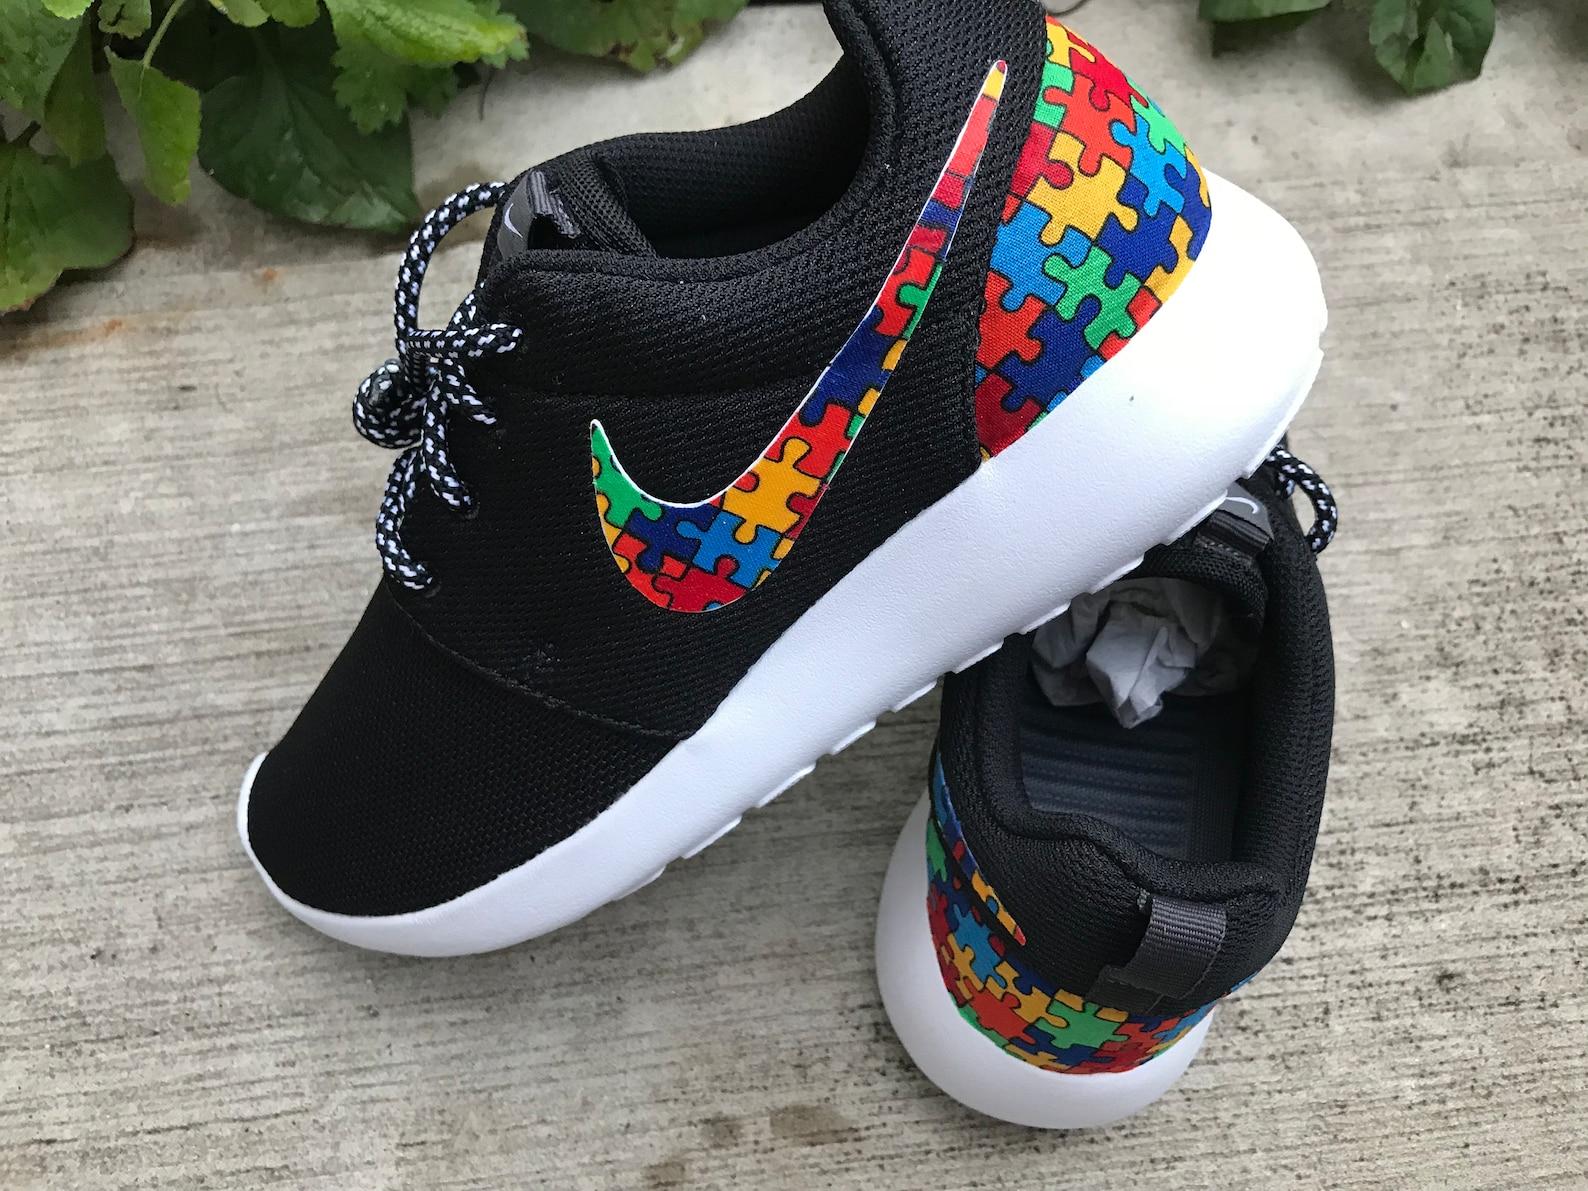 Autism Awareness Sneakers